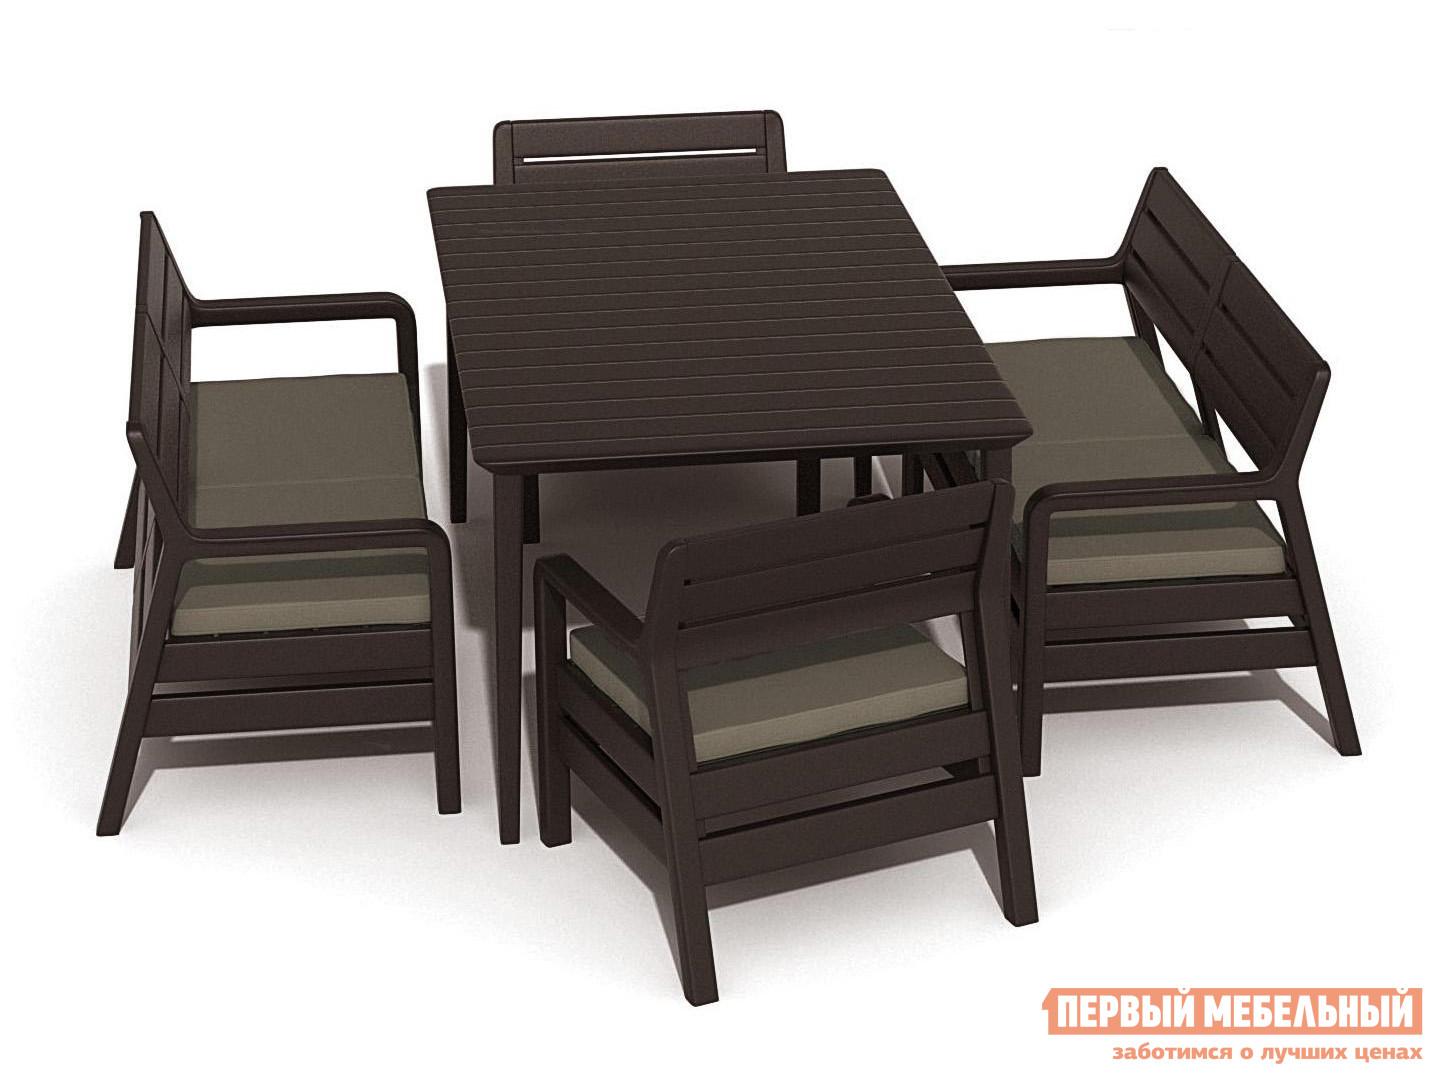 Набор пластиковой мебели Keter Delano set with Lima table 160 17205371/КОР